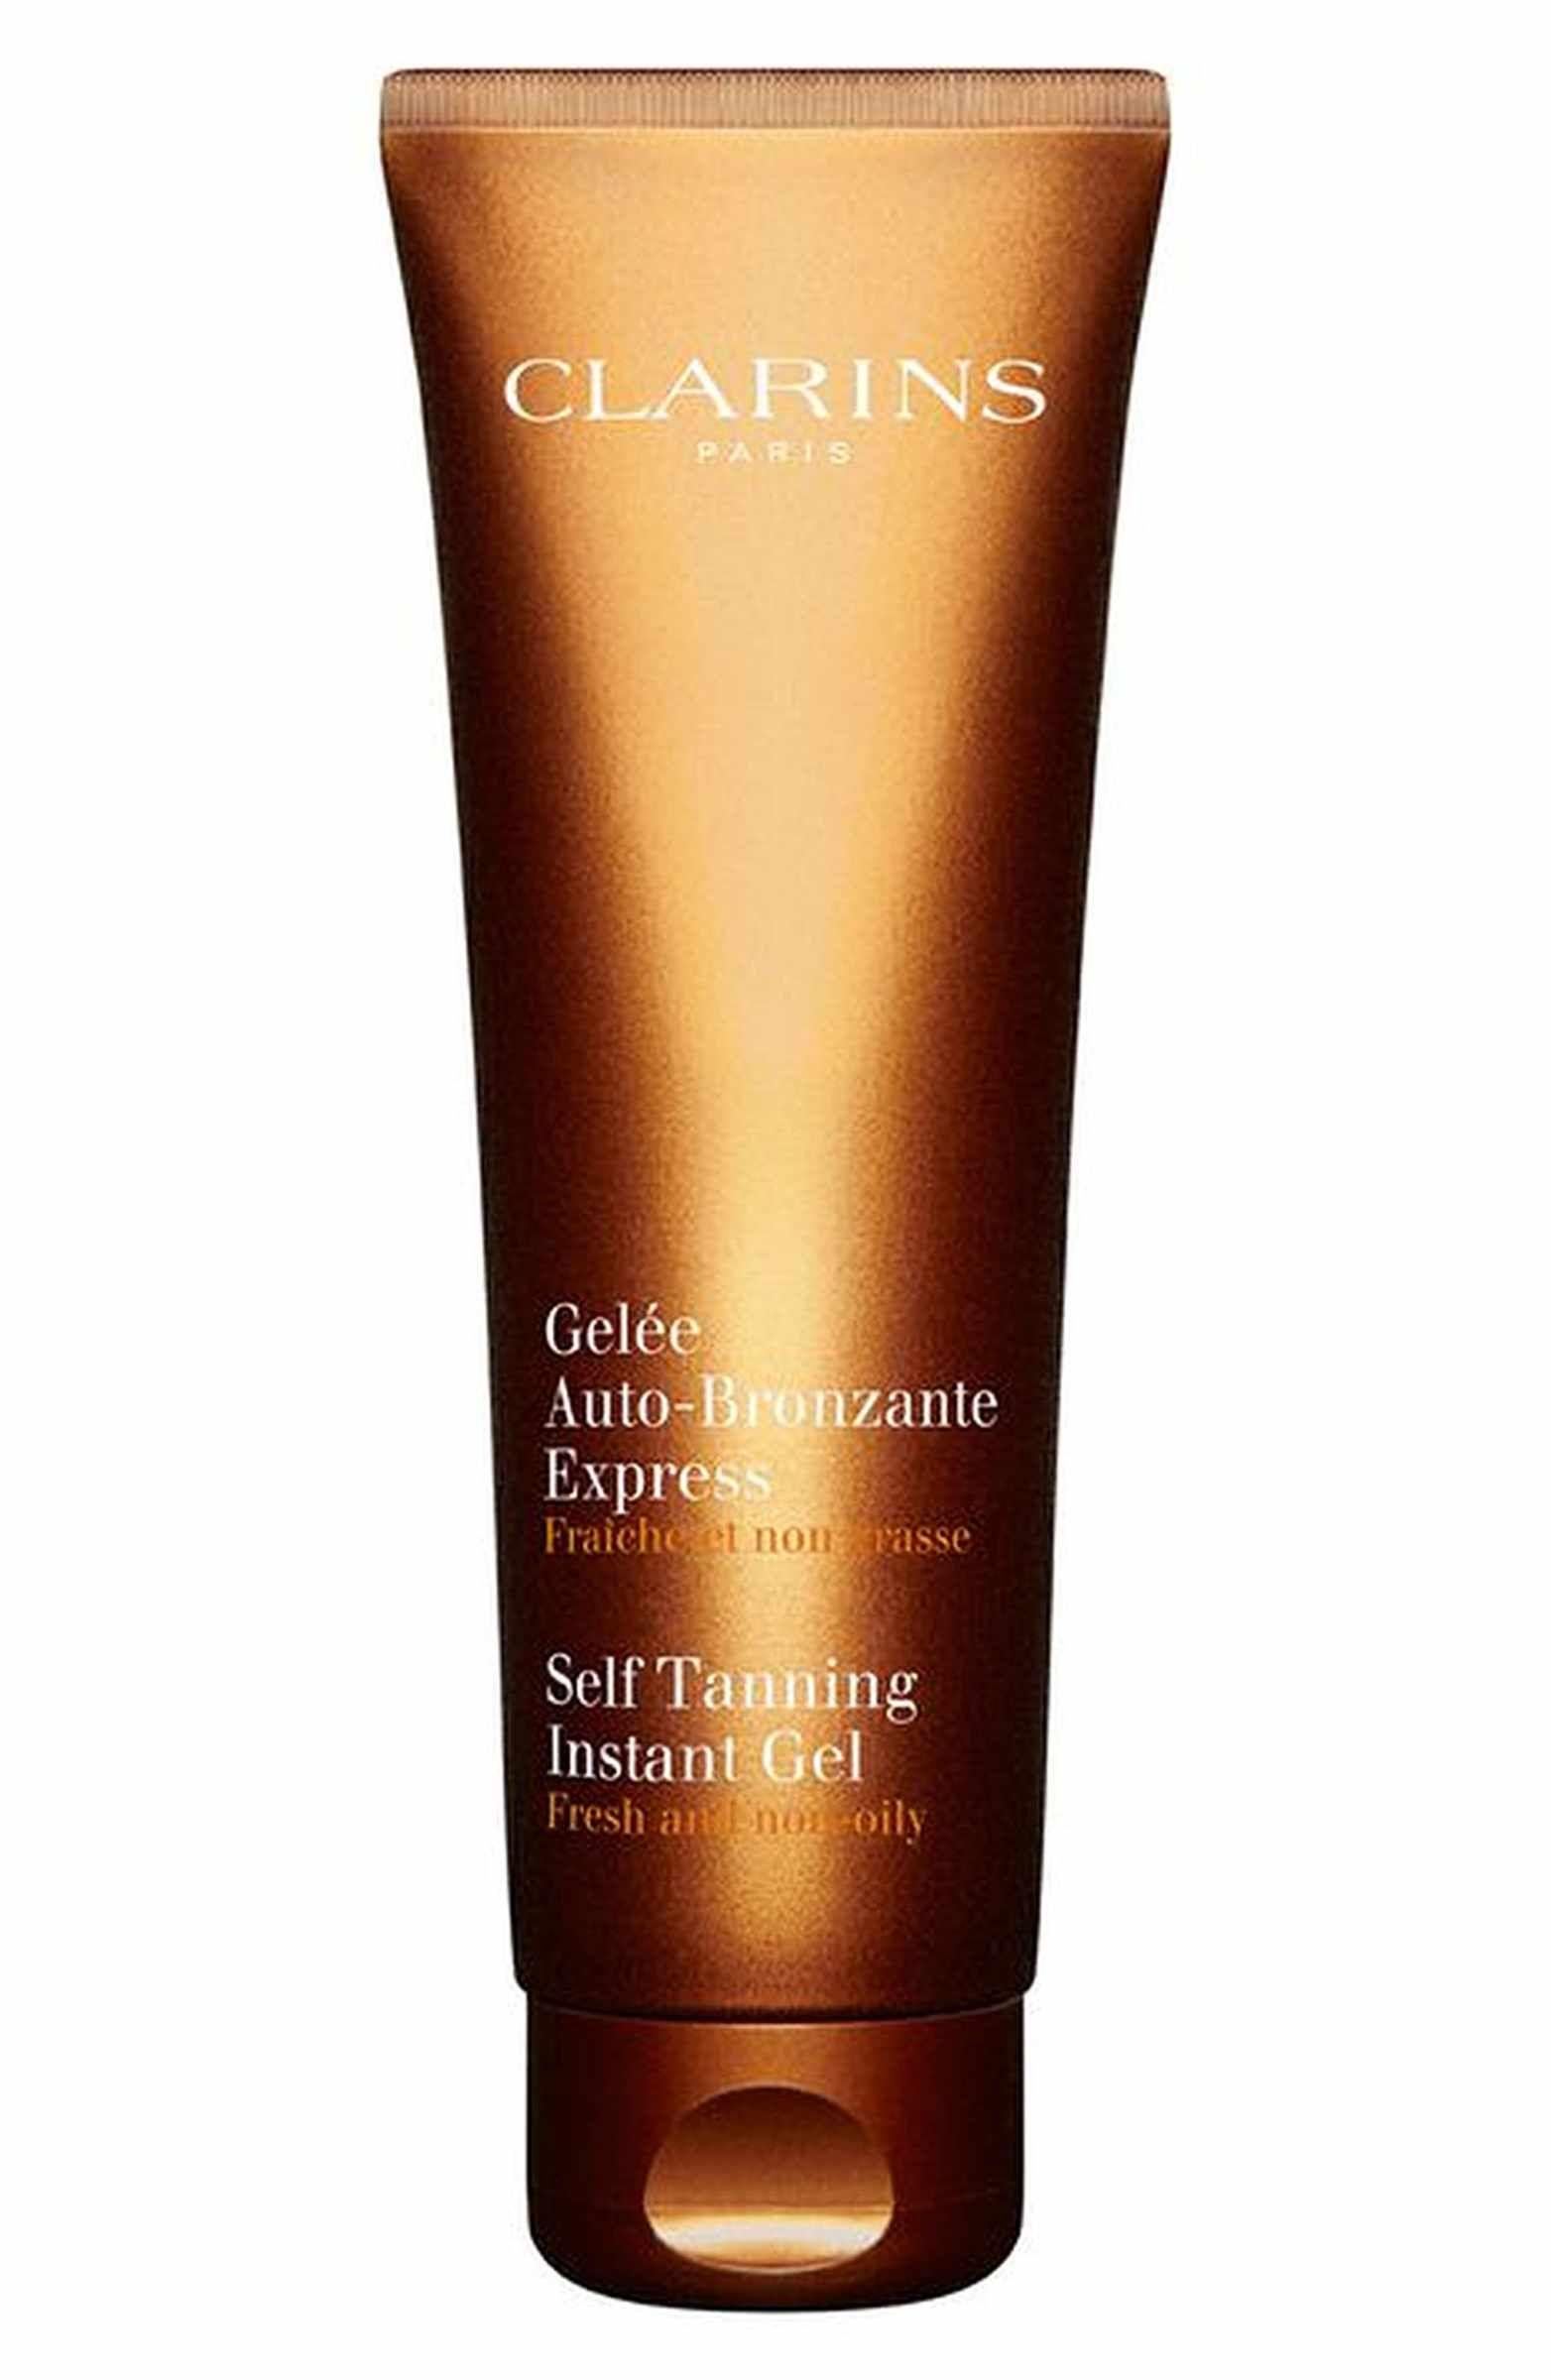 Clarins Self Tanning Instant Gel Best self tanner, Self